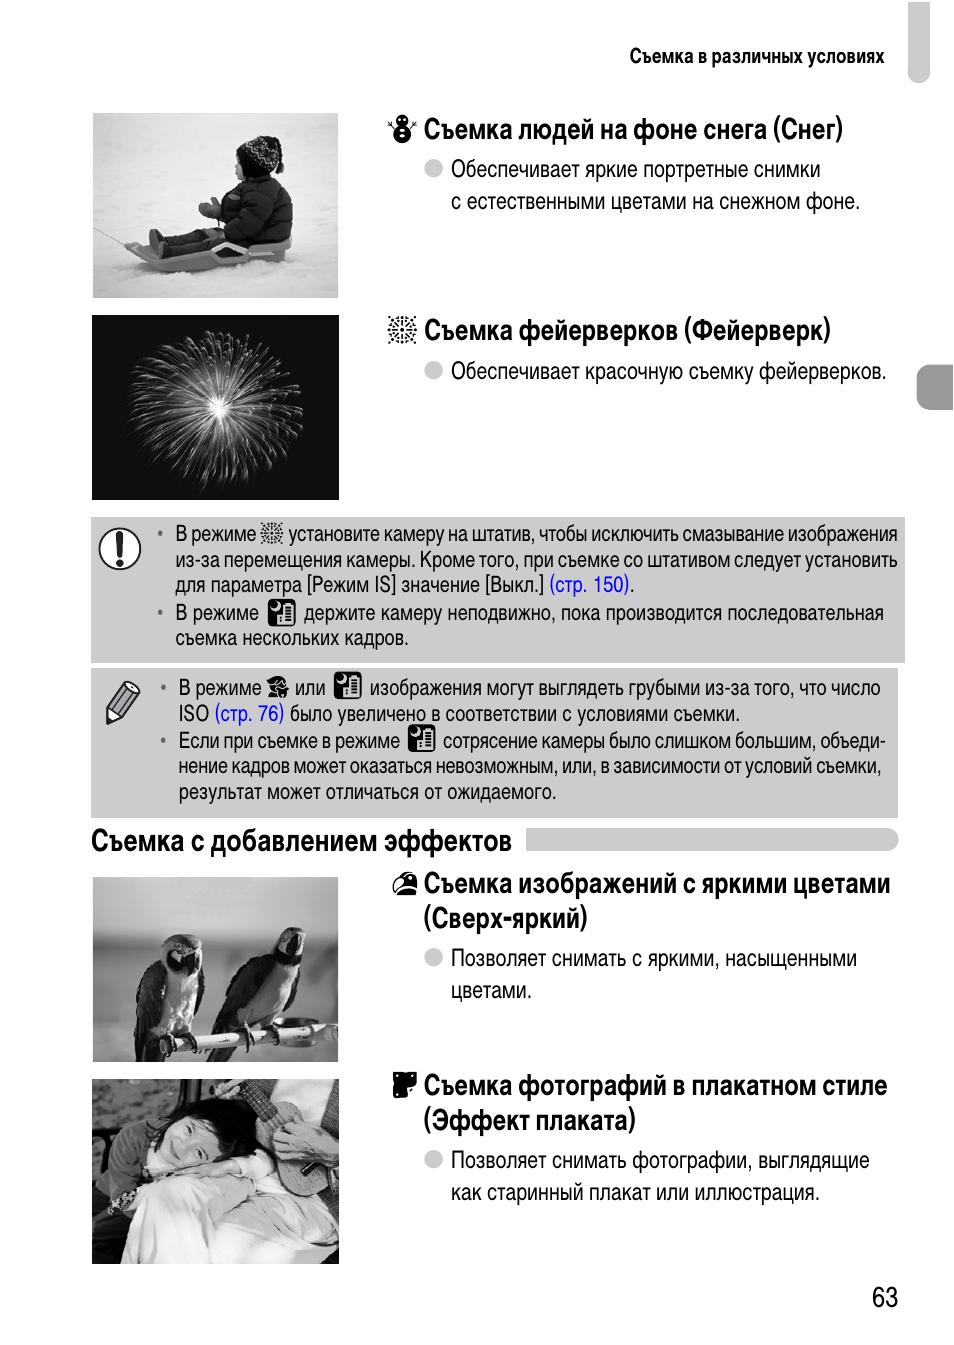 Параметры фотоаппарата для съемки фейерверков